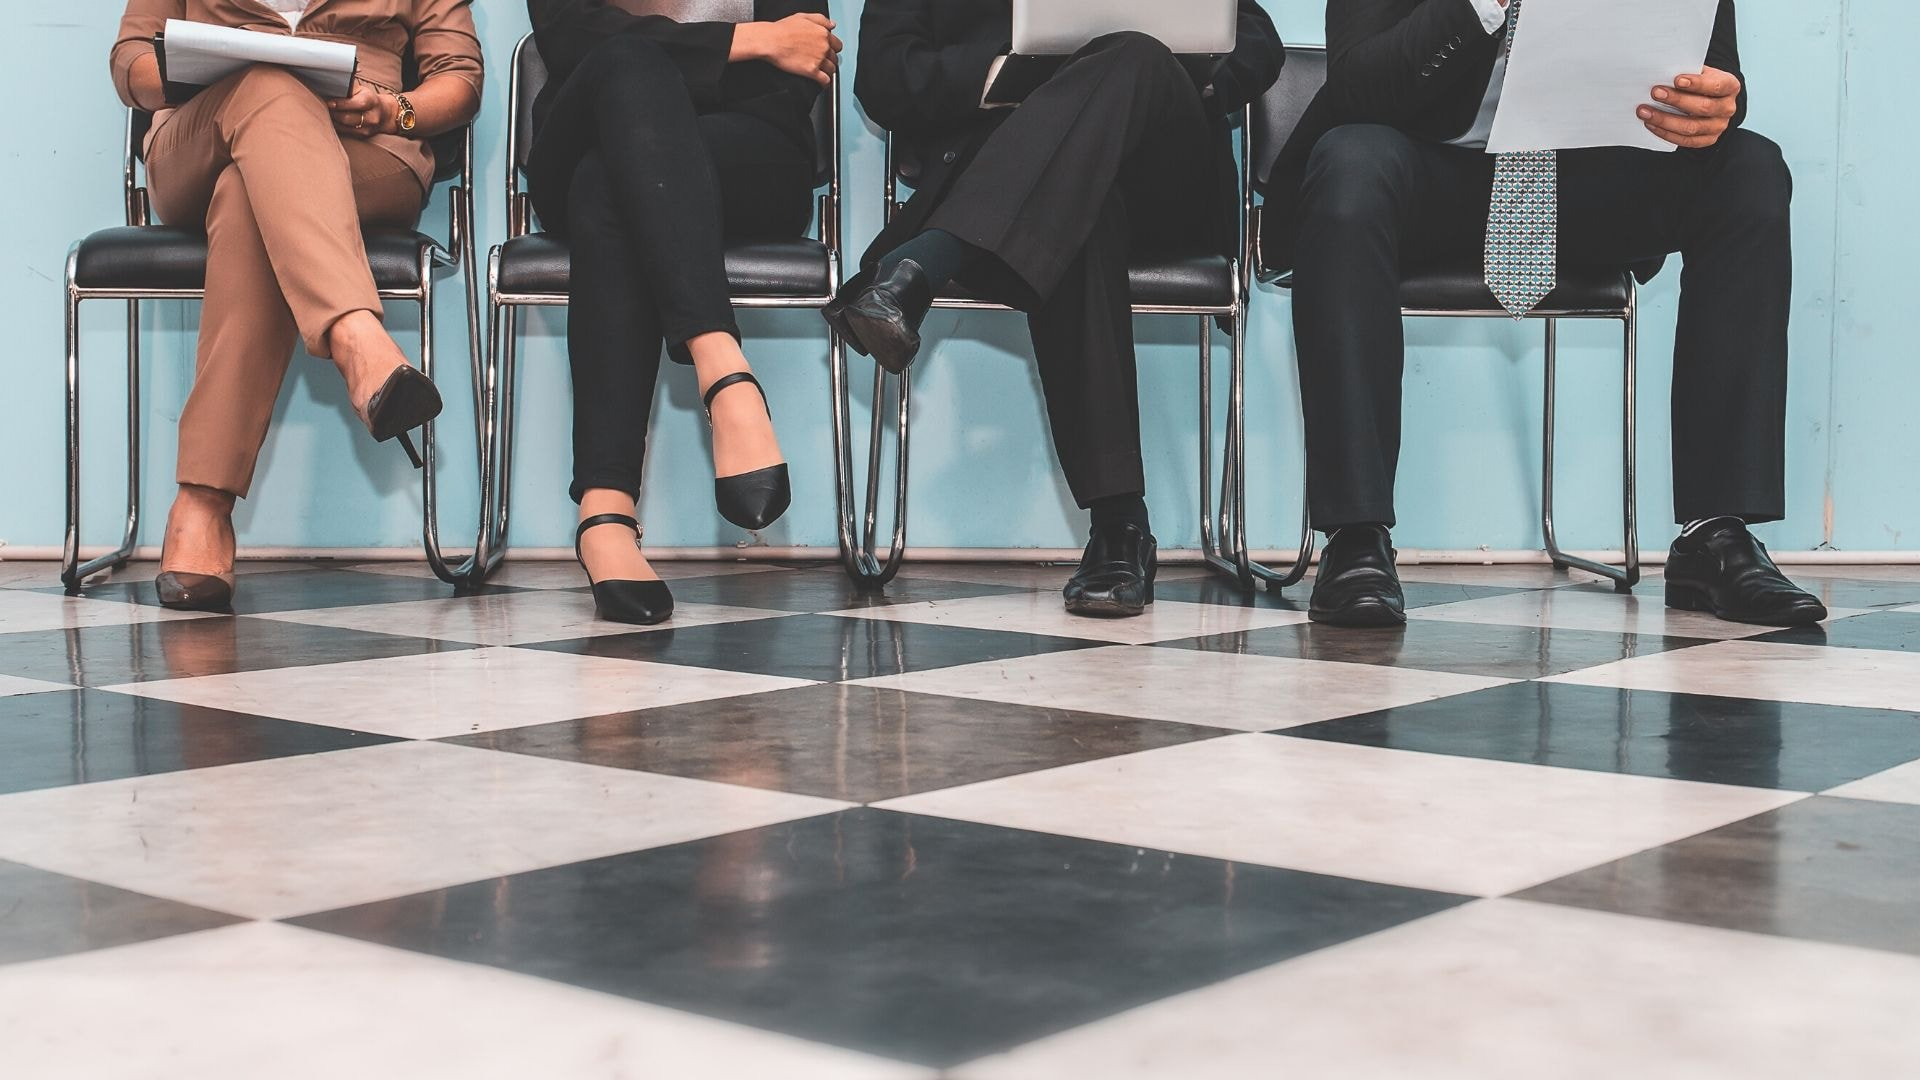 canva, entretien d'embauche, travail, cv